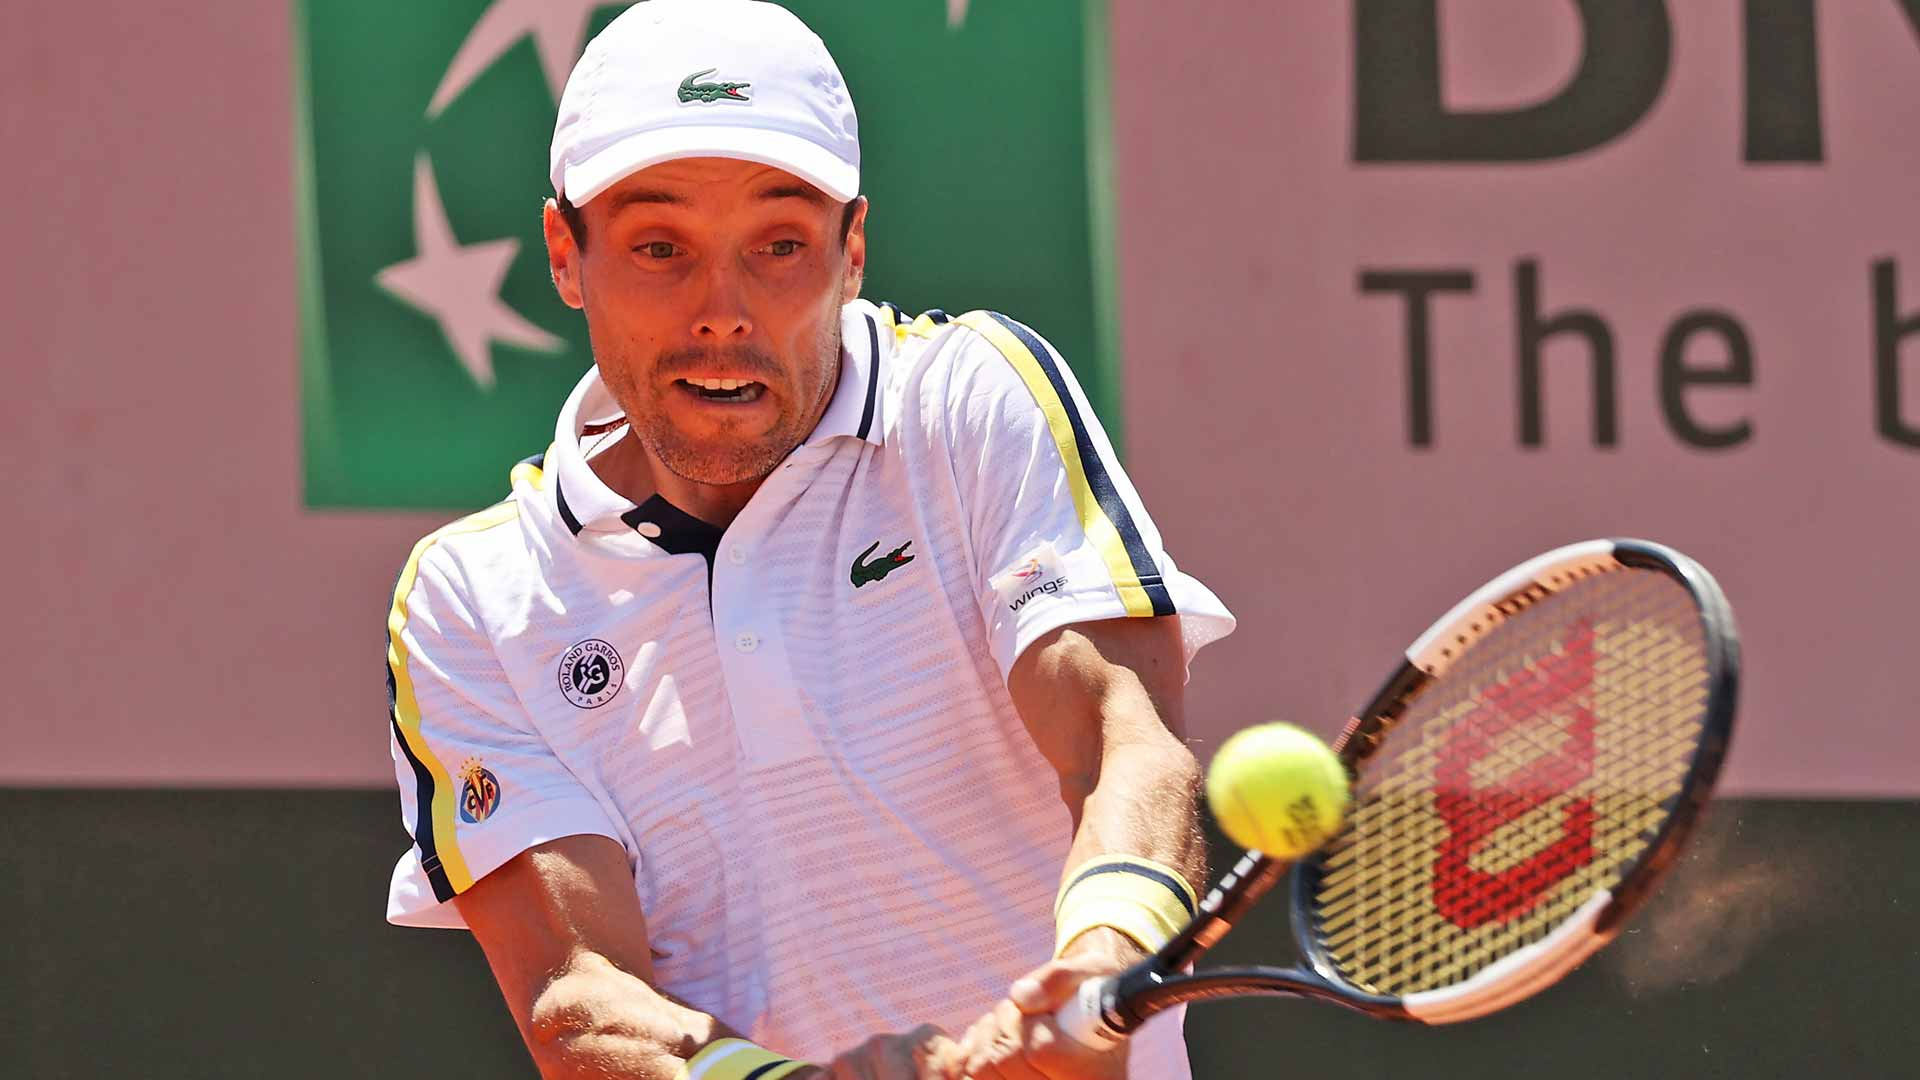 Roland Garros 2021: Roberto Bautista Agut vs. Henri Laaksonen Tennis Pick and Prediction